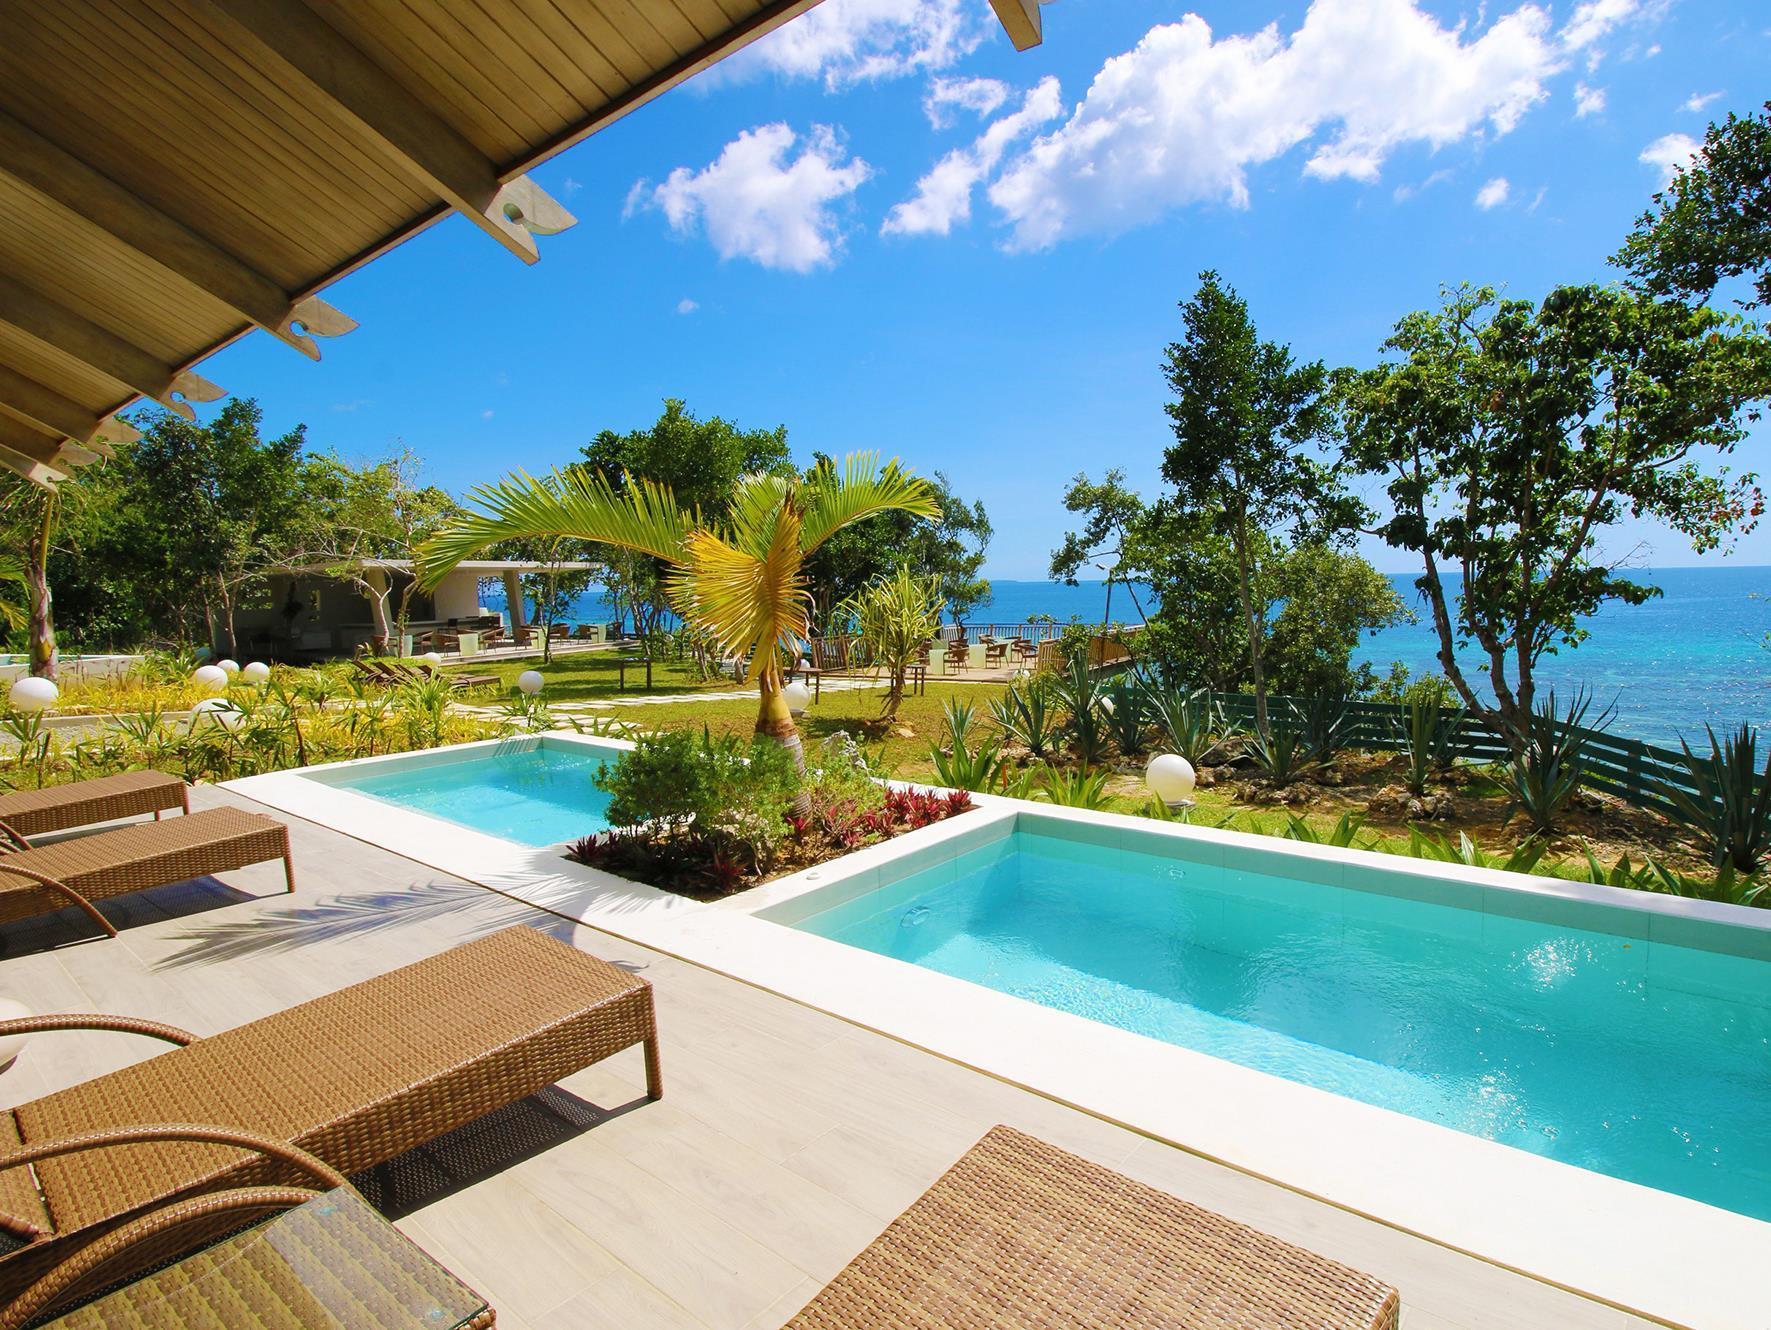 Bohol shores bohol philippines great discounted rates Tagbilaran hotels with swimming pool